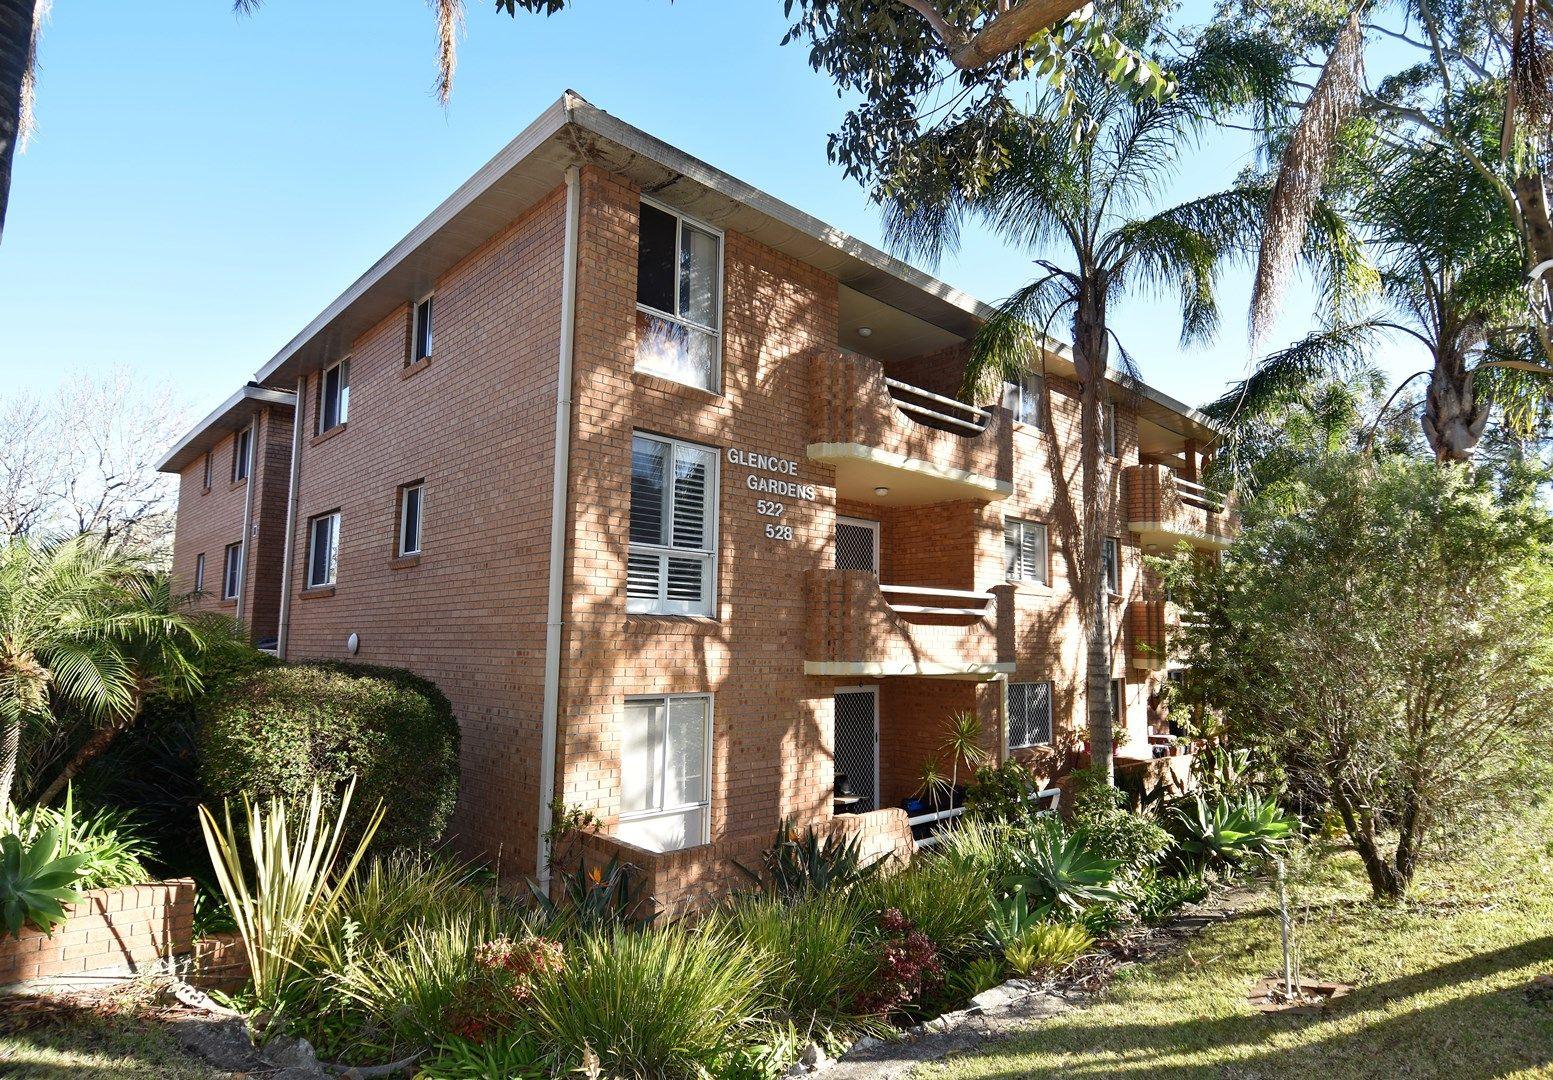 8/522-528 President Avenue, Sutherland NSW 2232, Image 0